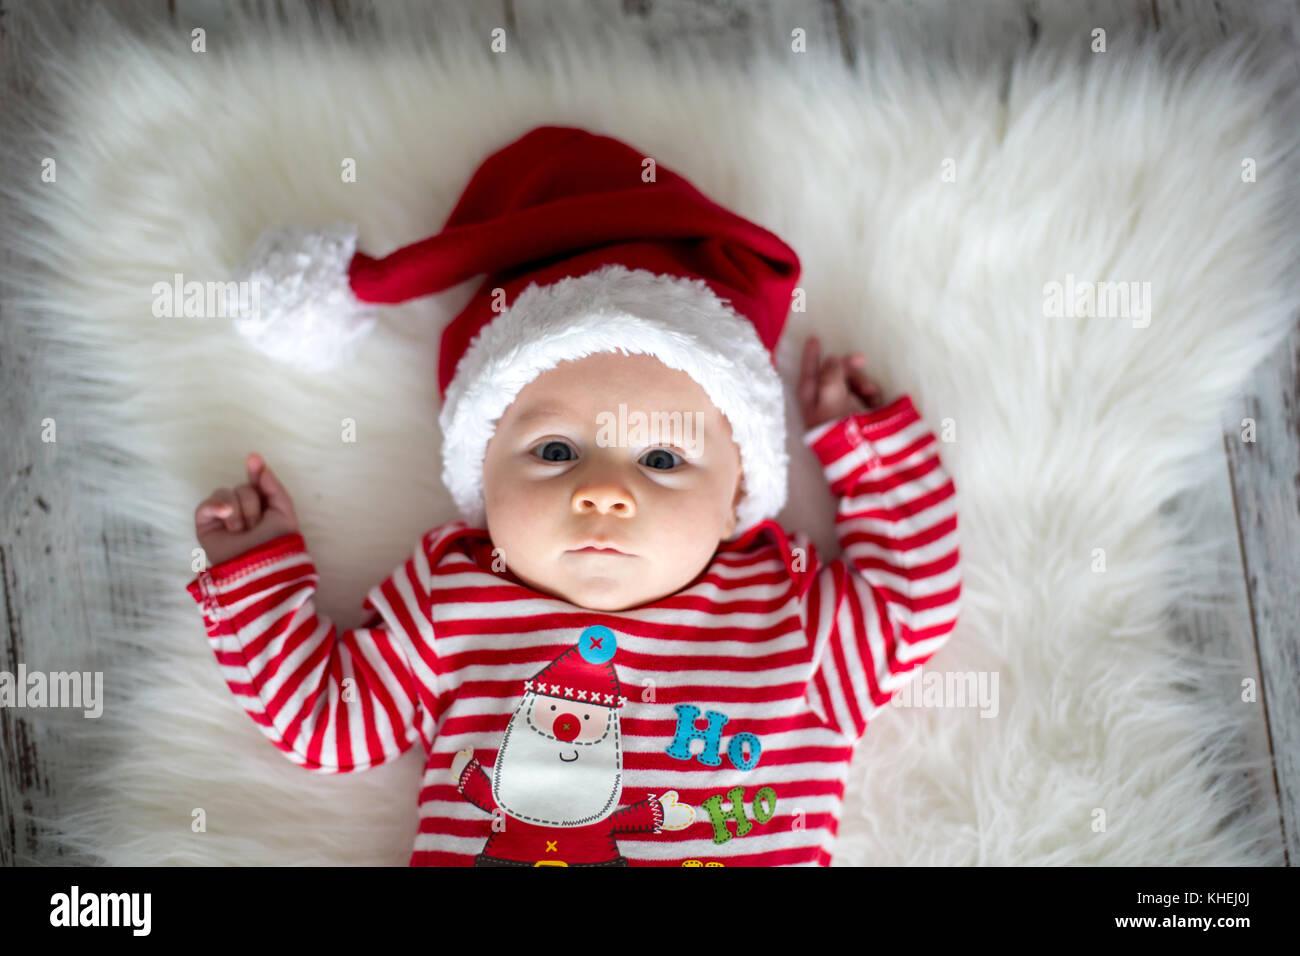 11e7641d4 Christmas portrait of cute little newborn baby boy, dressed in Stock ...